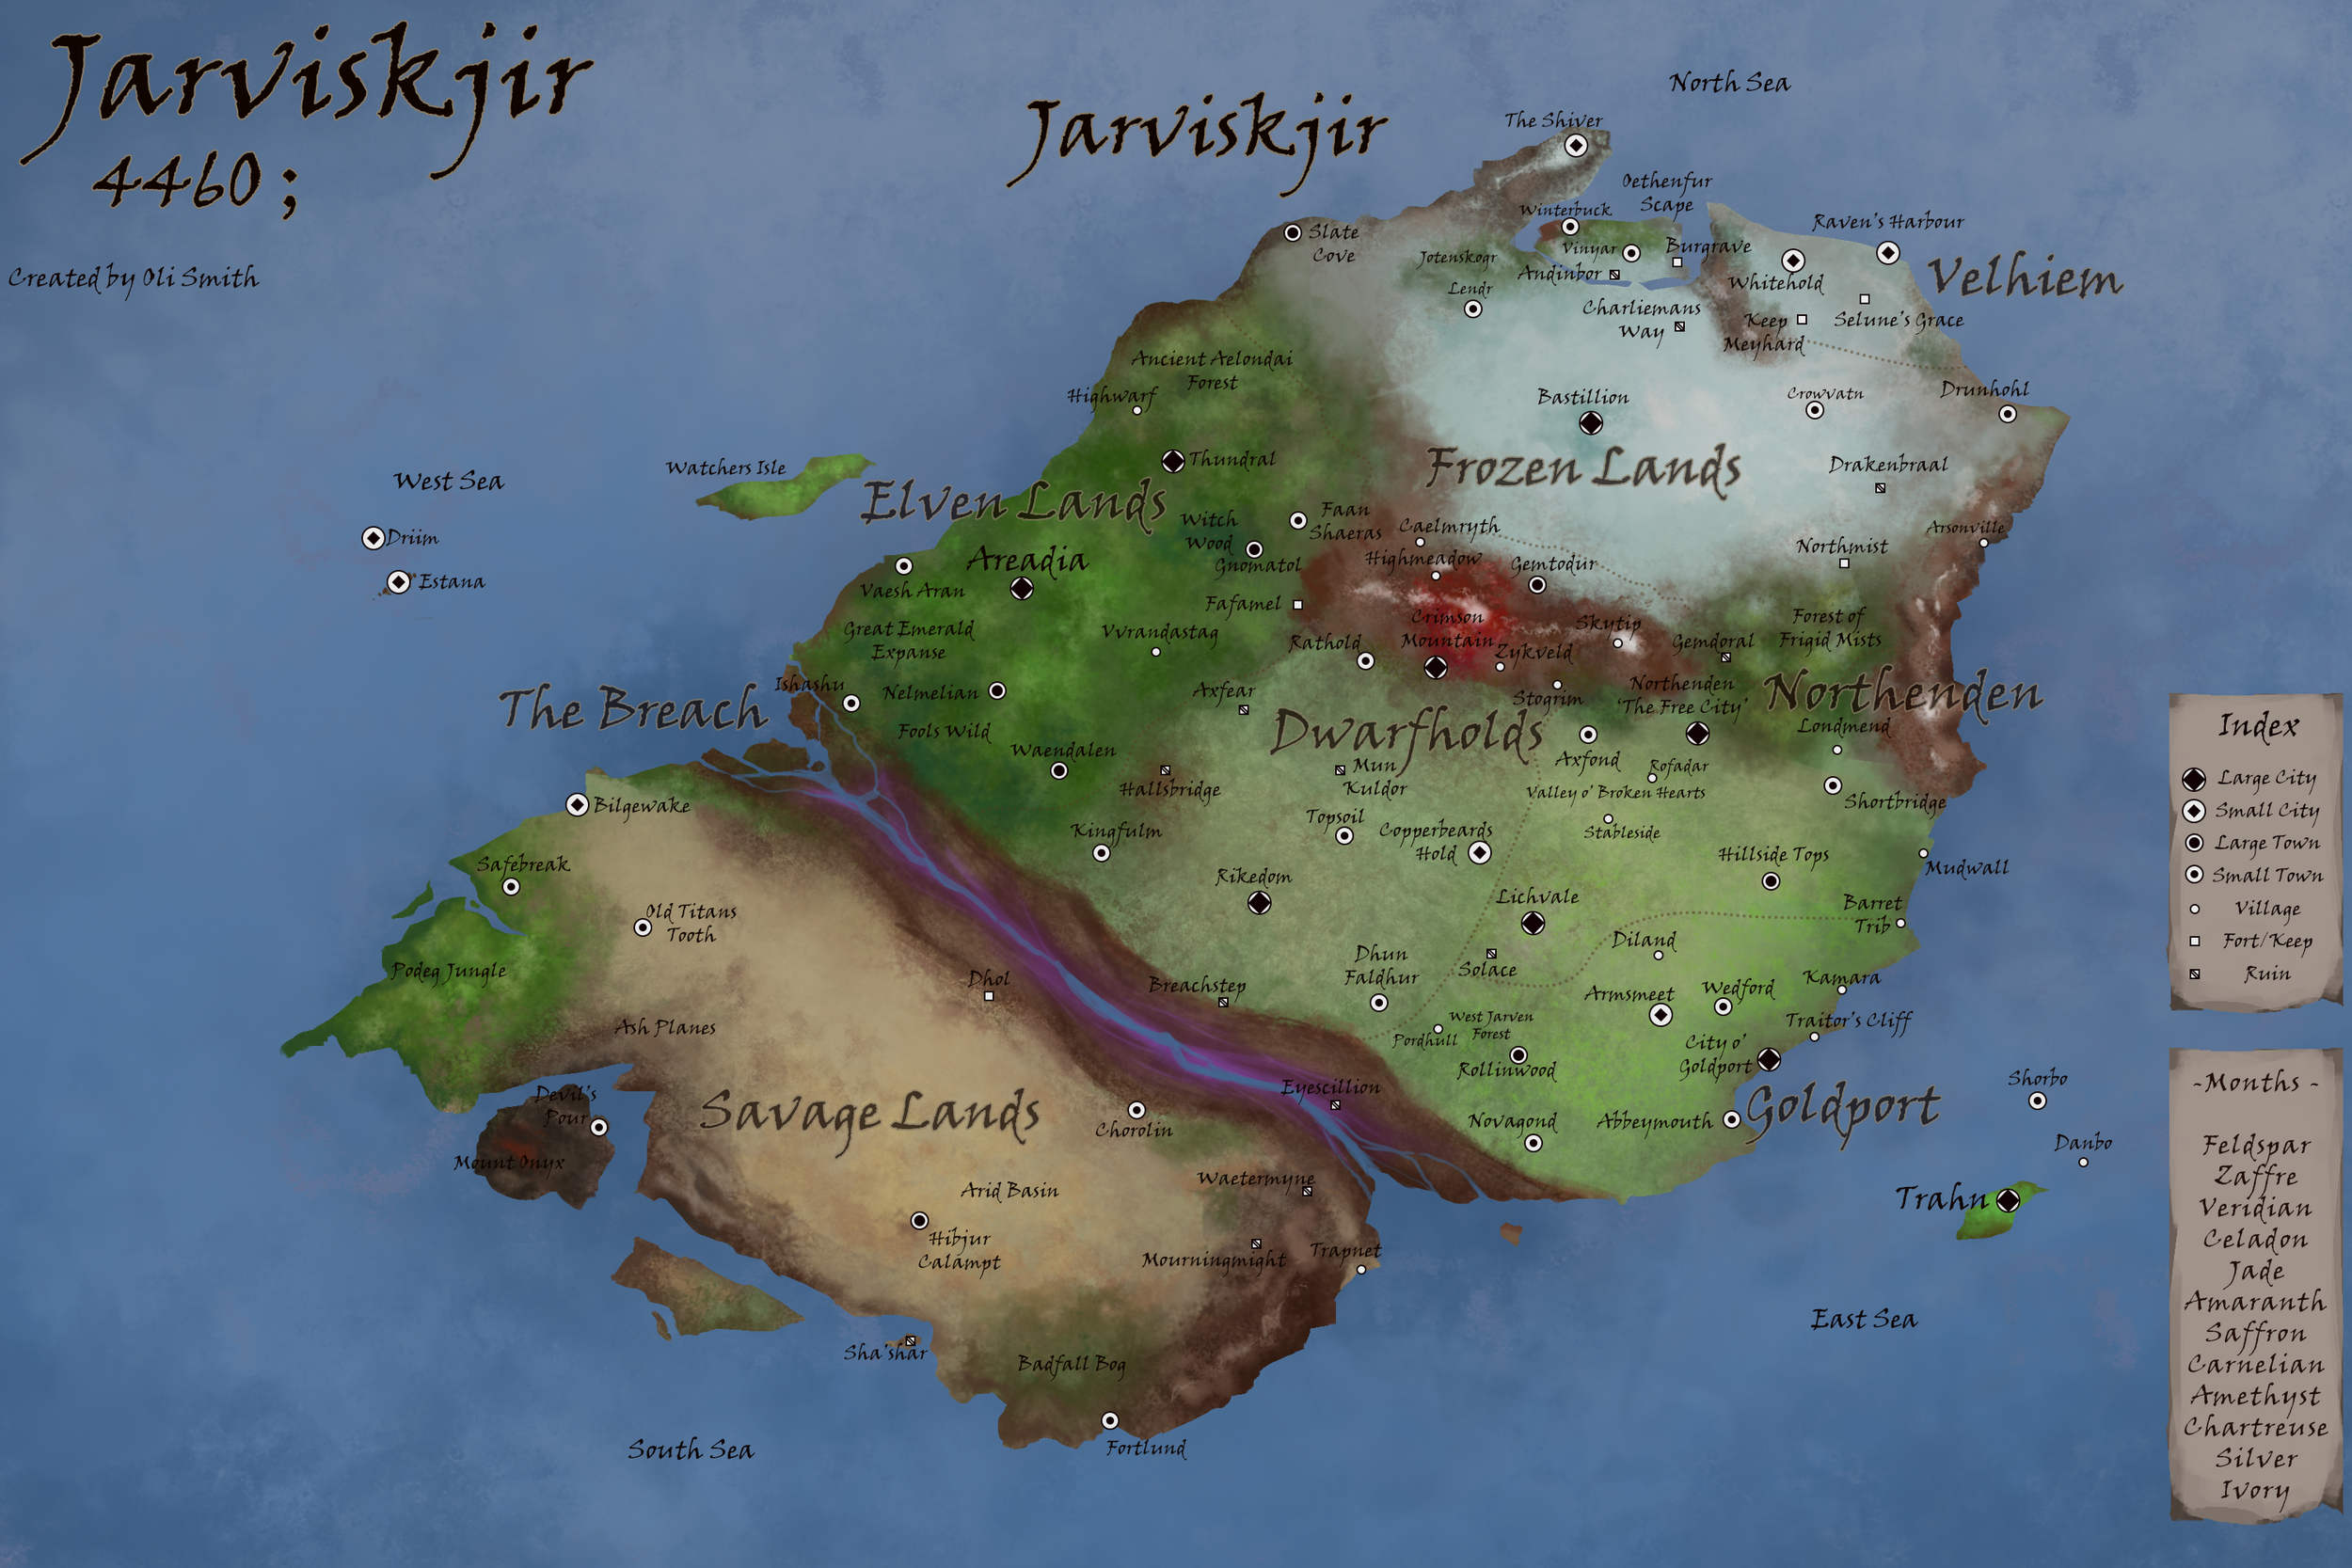 newjarivskjirmap4.png